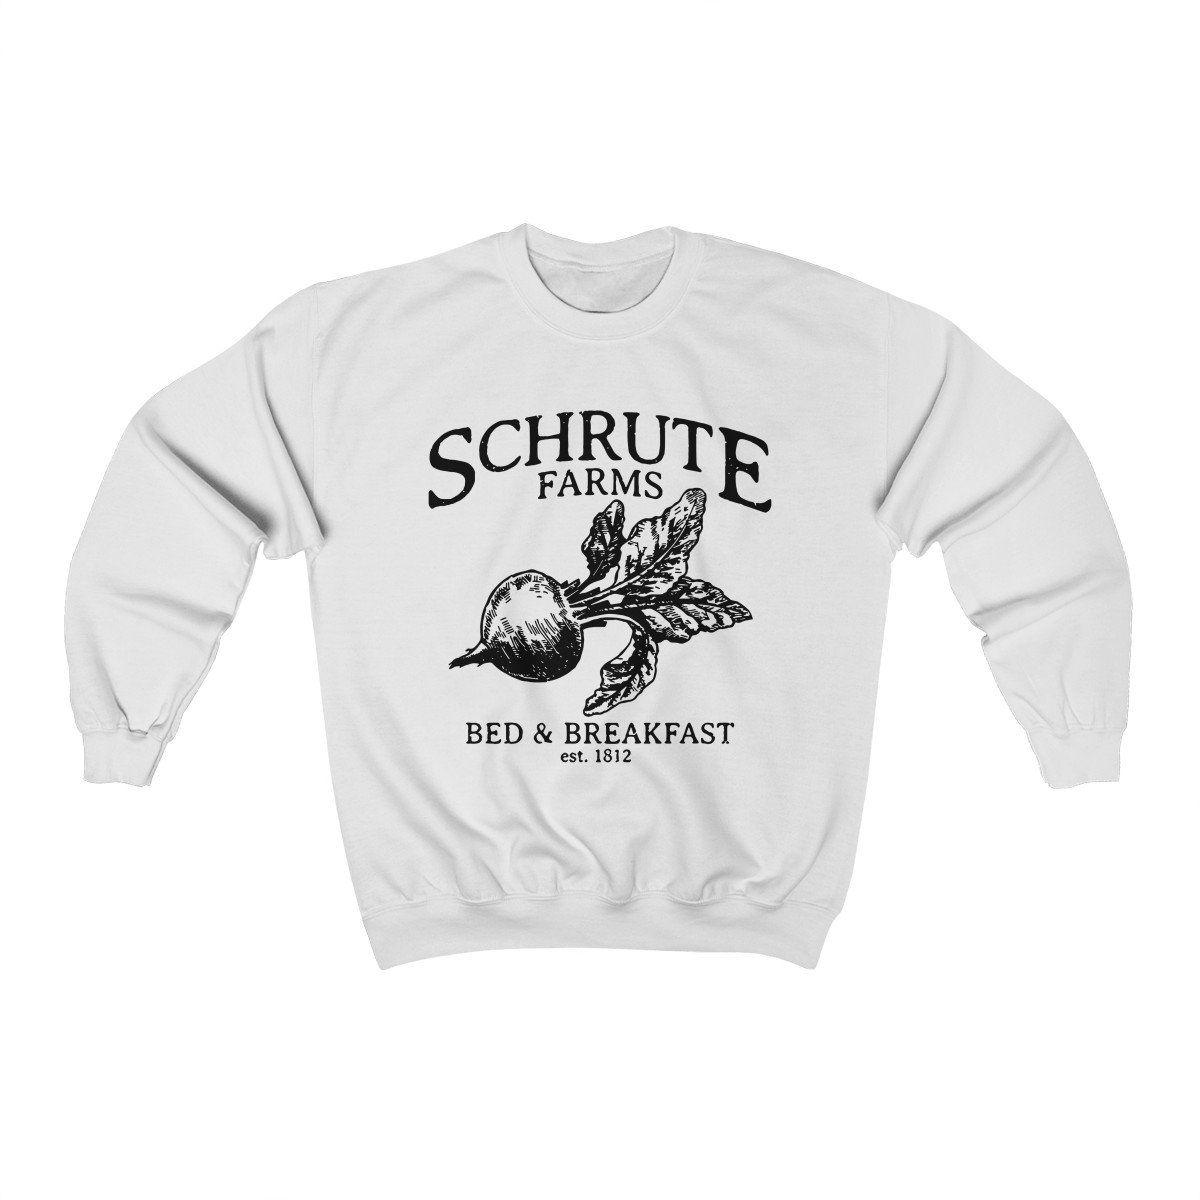 Schrute Farms The Office Unisex Heavy Blend Crewneck Sweatshirt By Graphicmugsetc On Etsy Sweatshirts Women Sweatshirts Houndstooth Leggings [ 1200 x 1200 Pixel ]